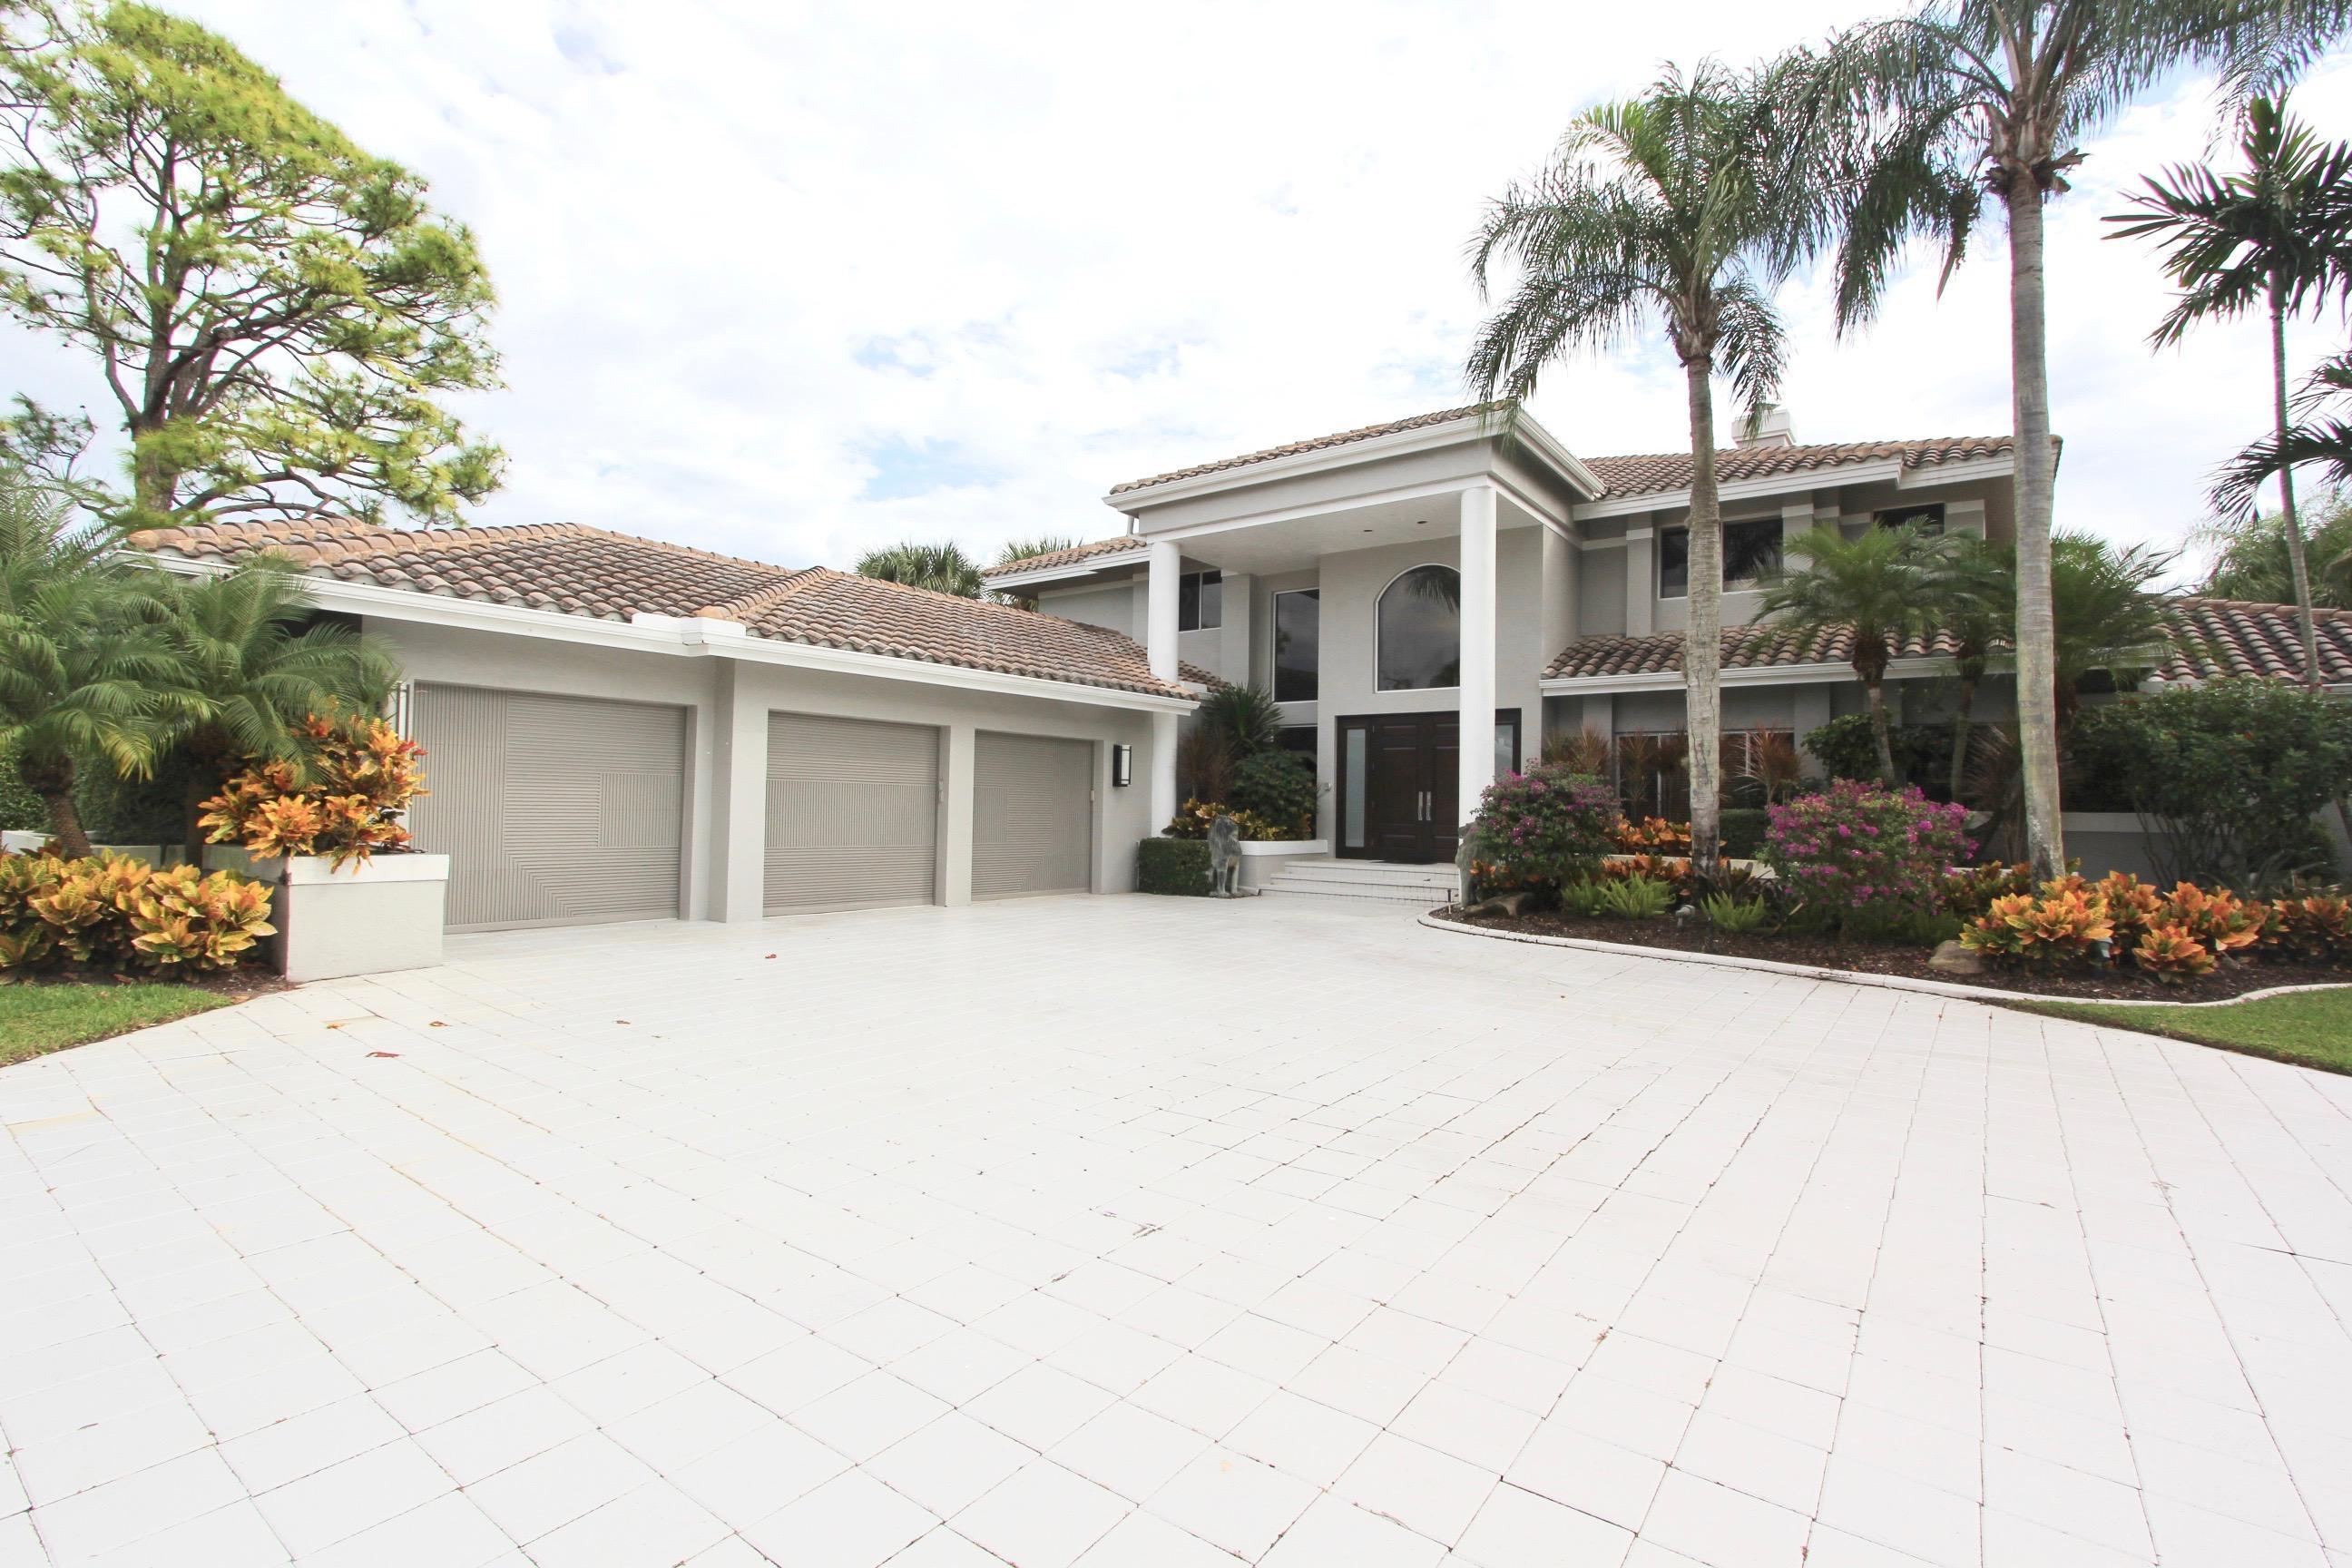 6241 Hollows Lane  Delray Beach, FL 33484